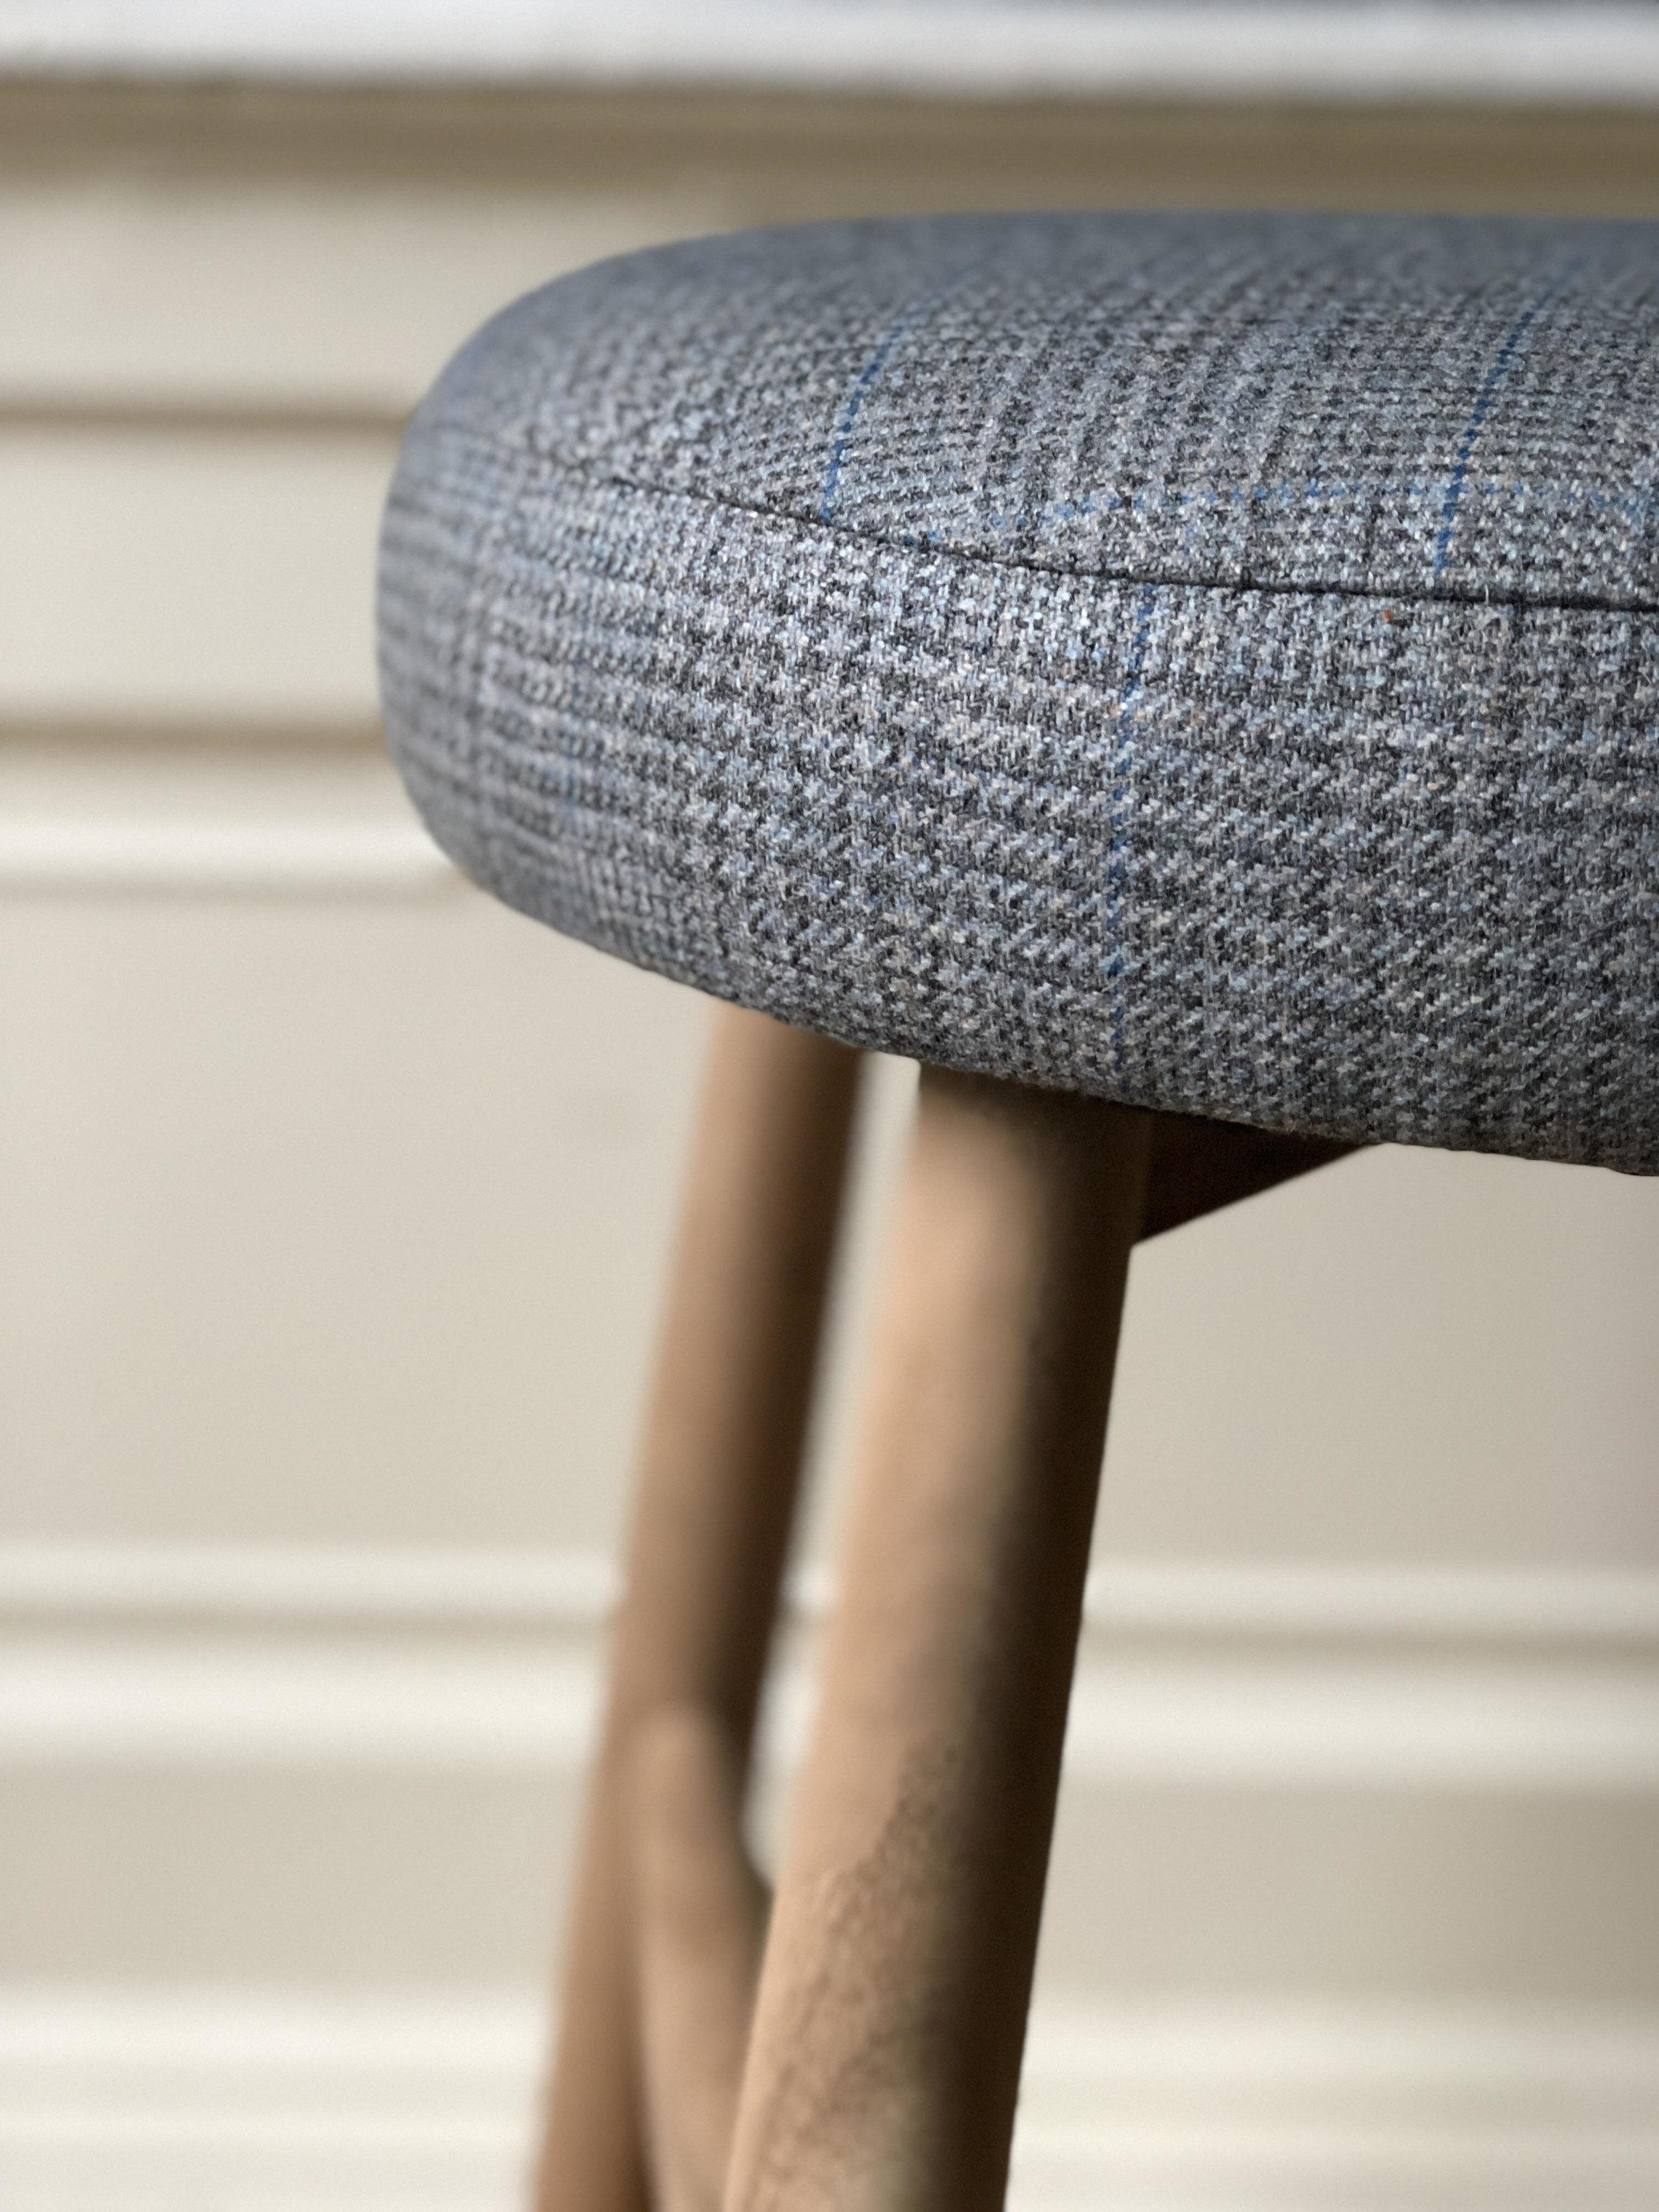 dreich stool close up 2.jpg